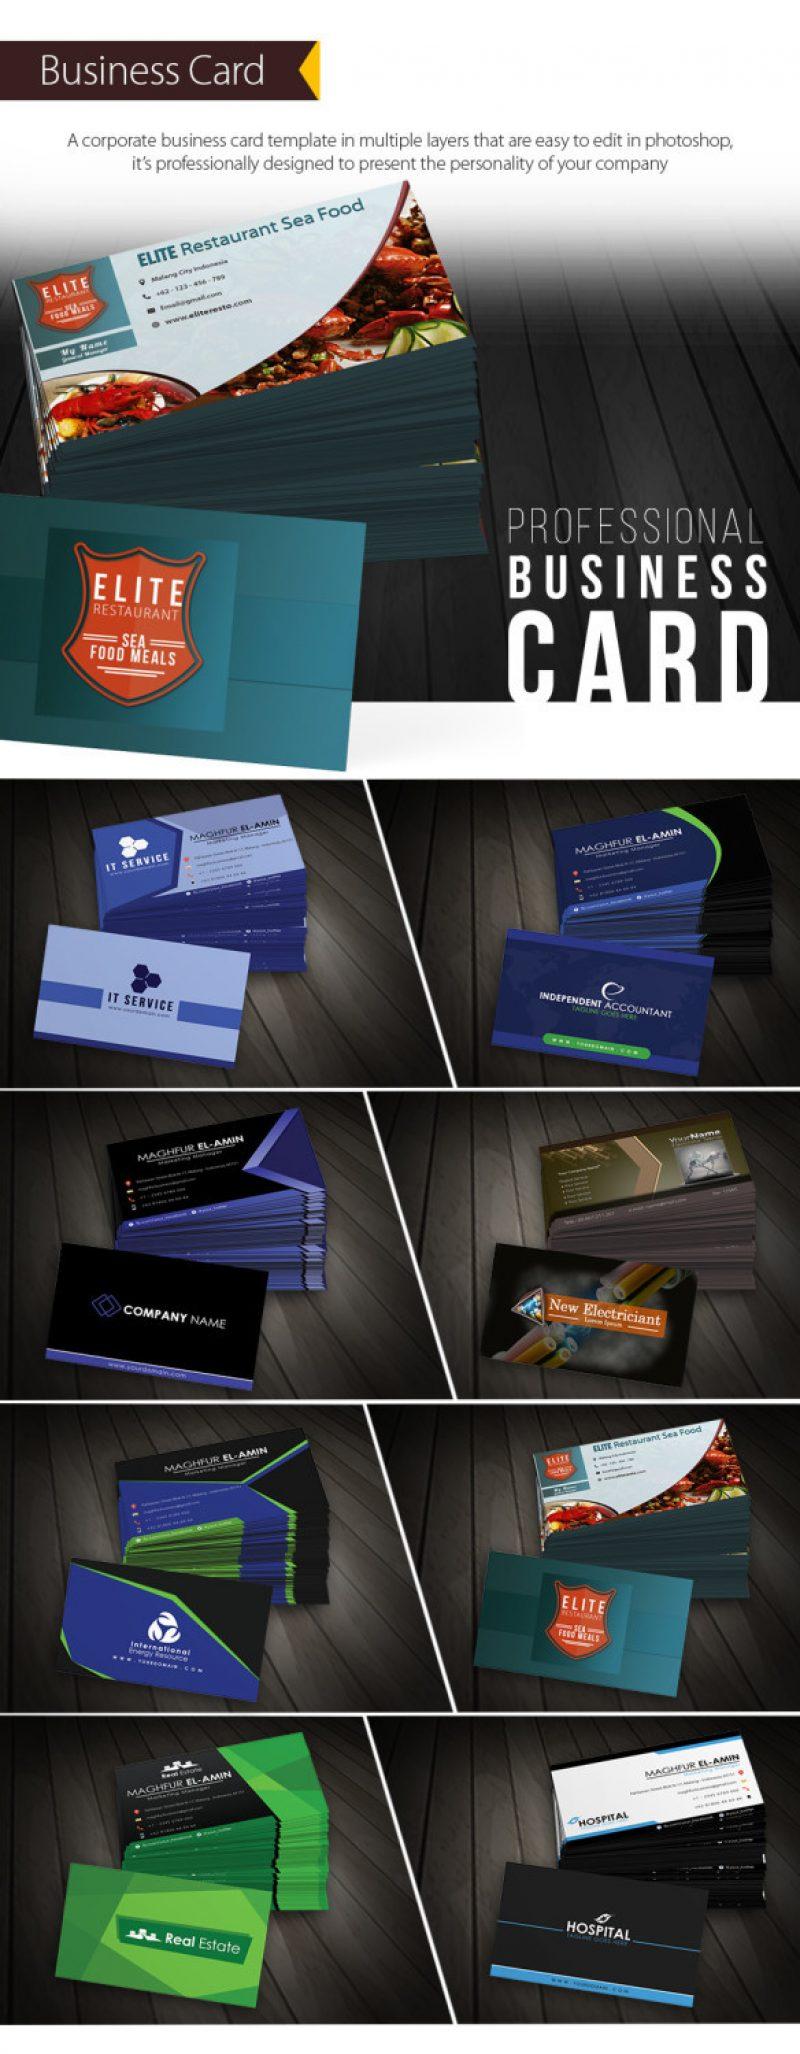 BusinessCard.jpg